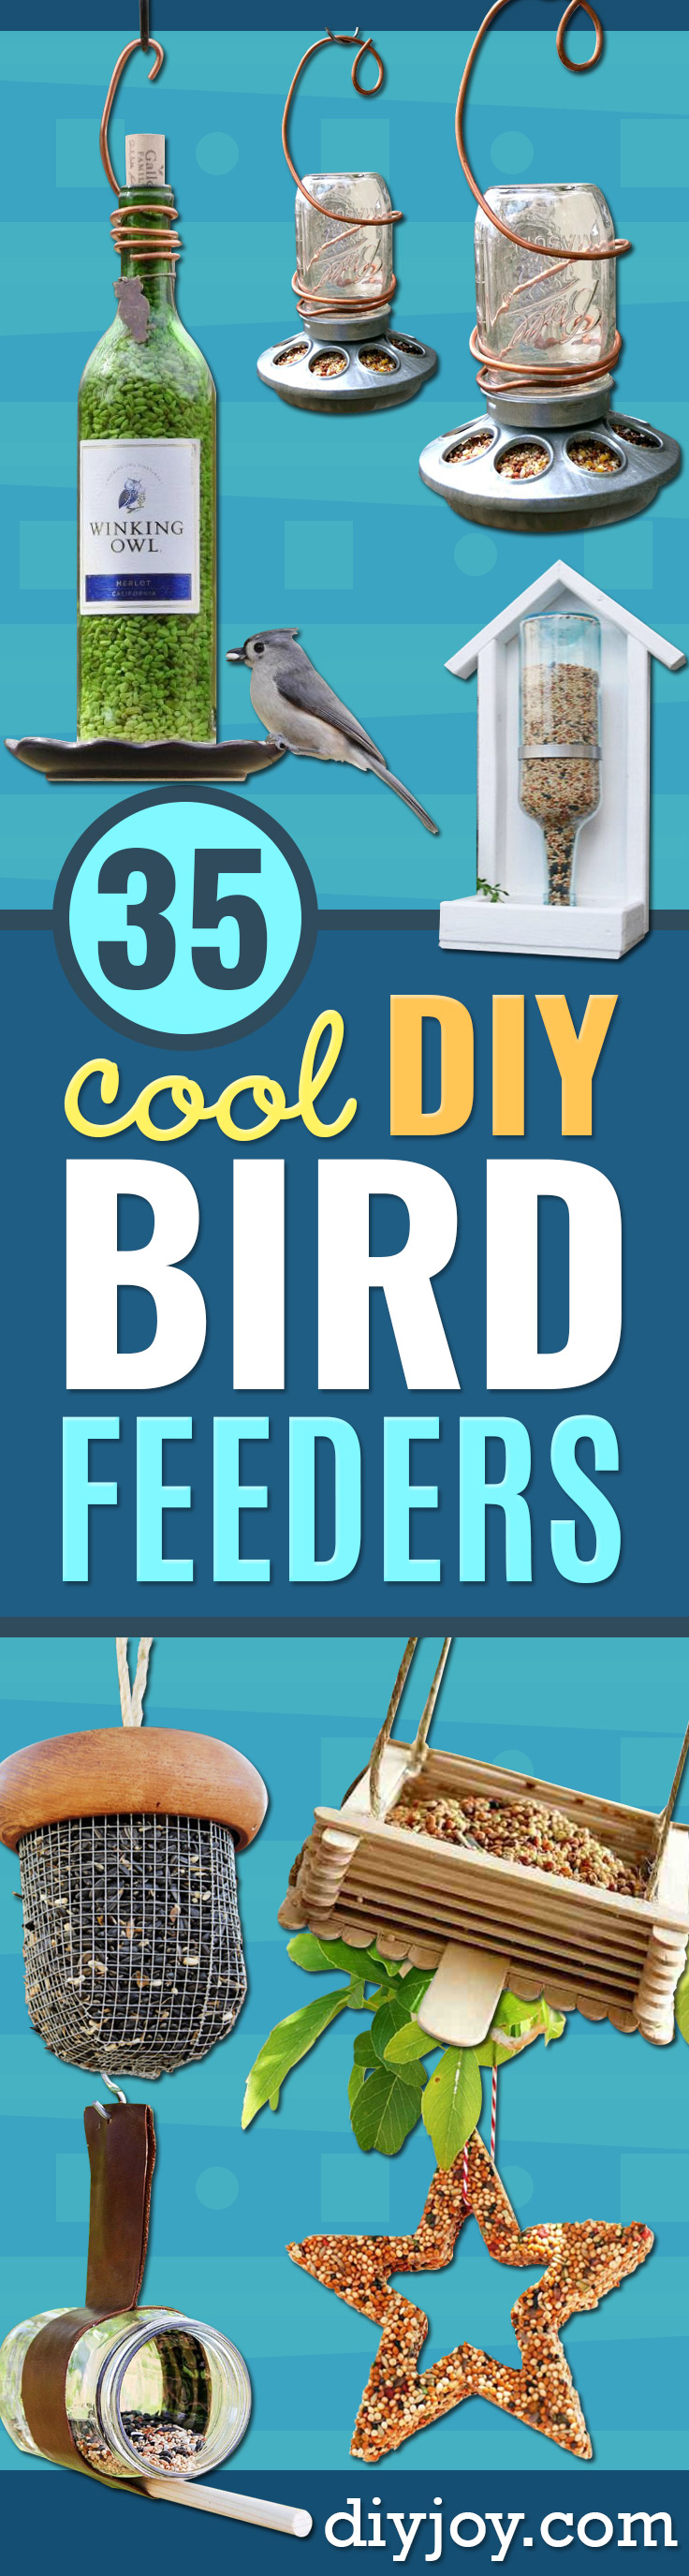 DIY Bird Feeders - Easy Do It Yourself Homemade Bird Feeder Ideas from Mason Jar, Wooden, Wine Bottle, Milk Jug, Plastic, Dollar Store Supplies - Squirrel Proof, Unique and Creative Tutorials That Make Cool DIY Gifts #birds